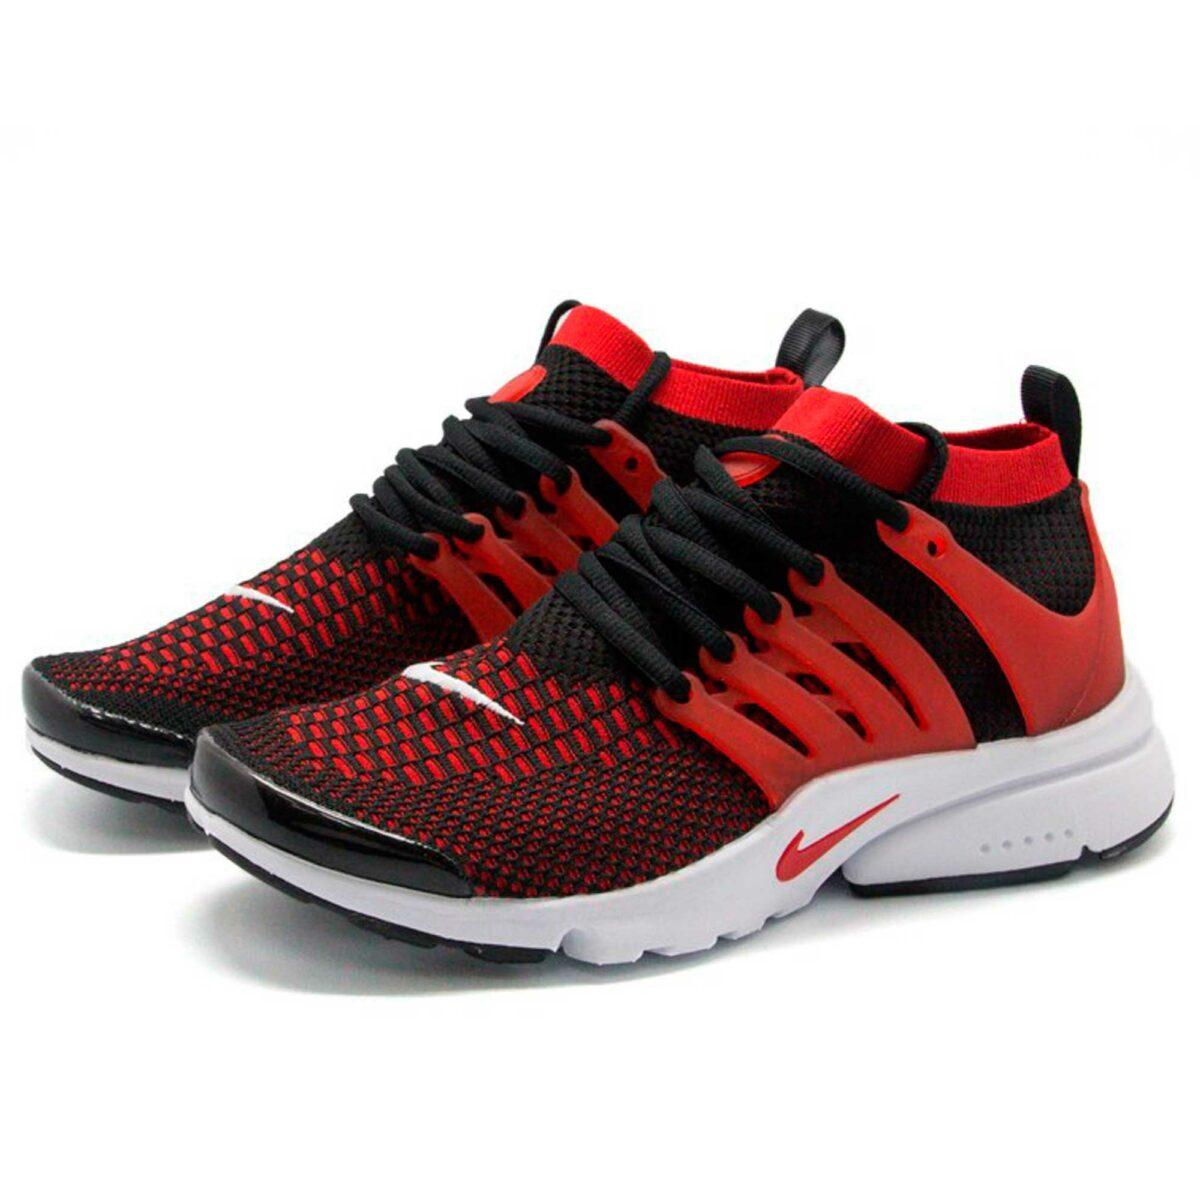 nike air presto black red купить